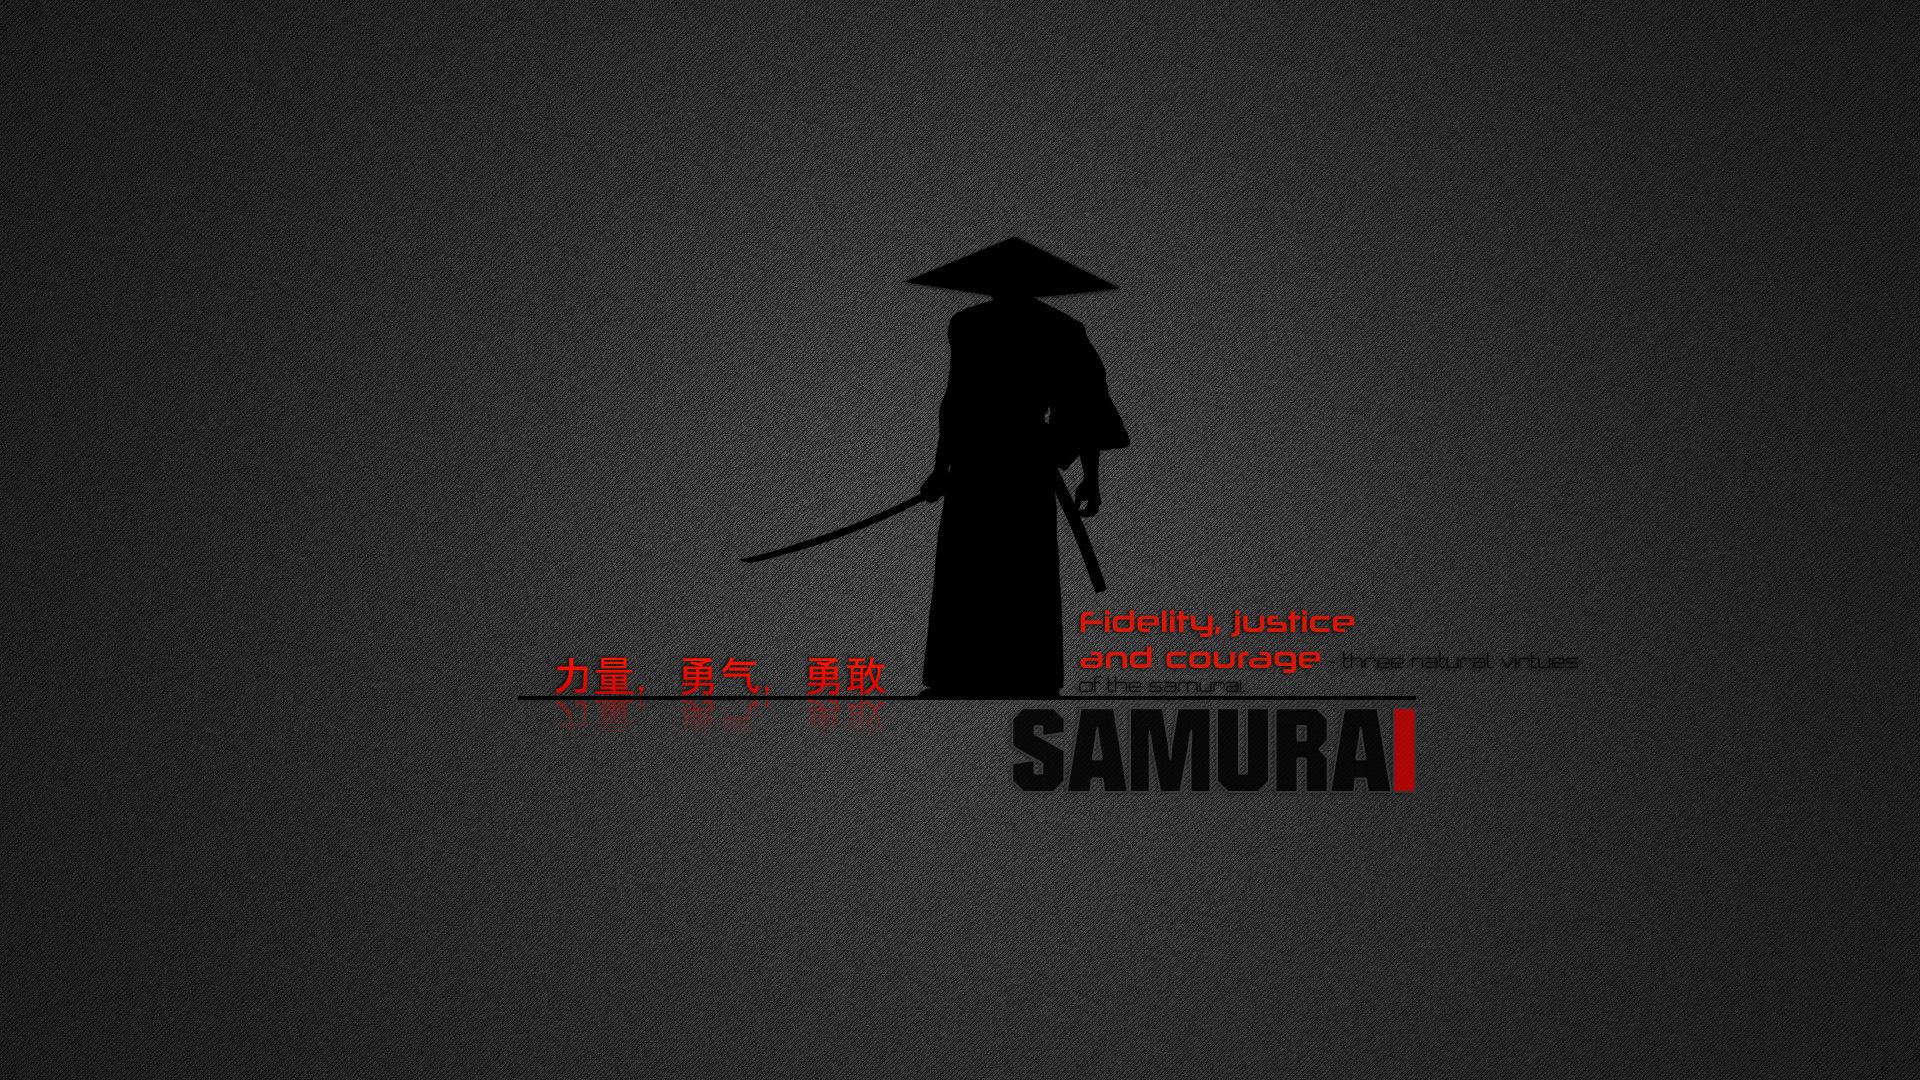 Samurai bushido code katana wallpaper 1920x1080 210646 1920x1080